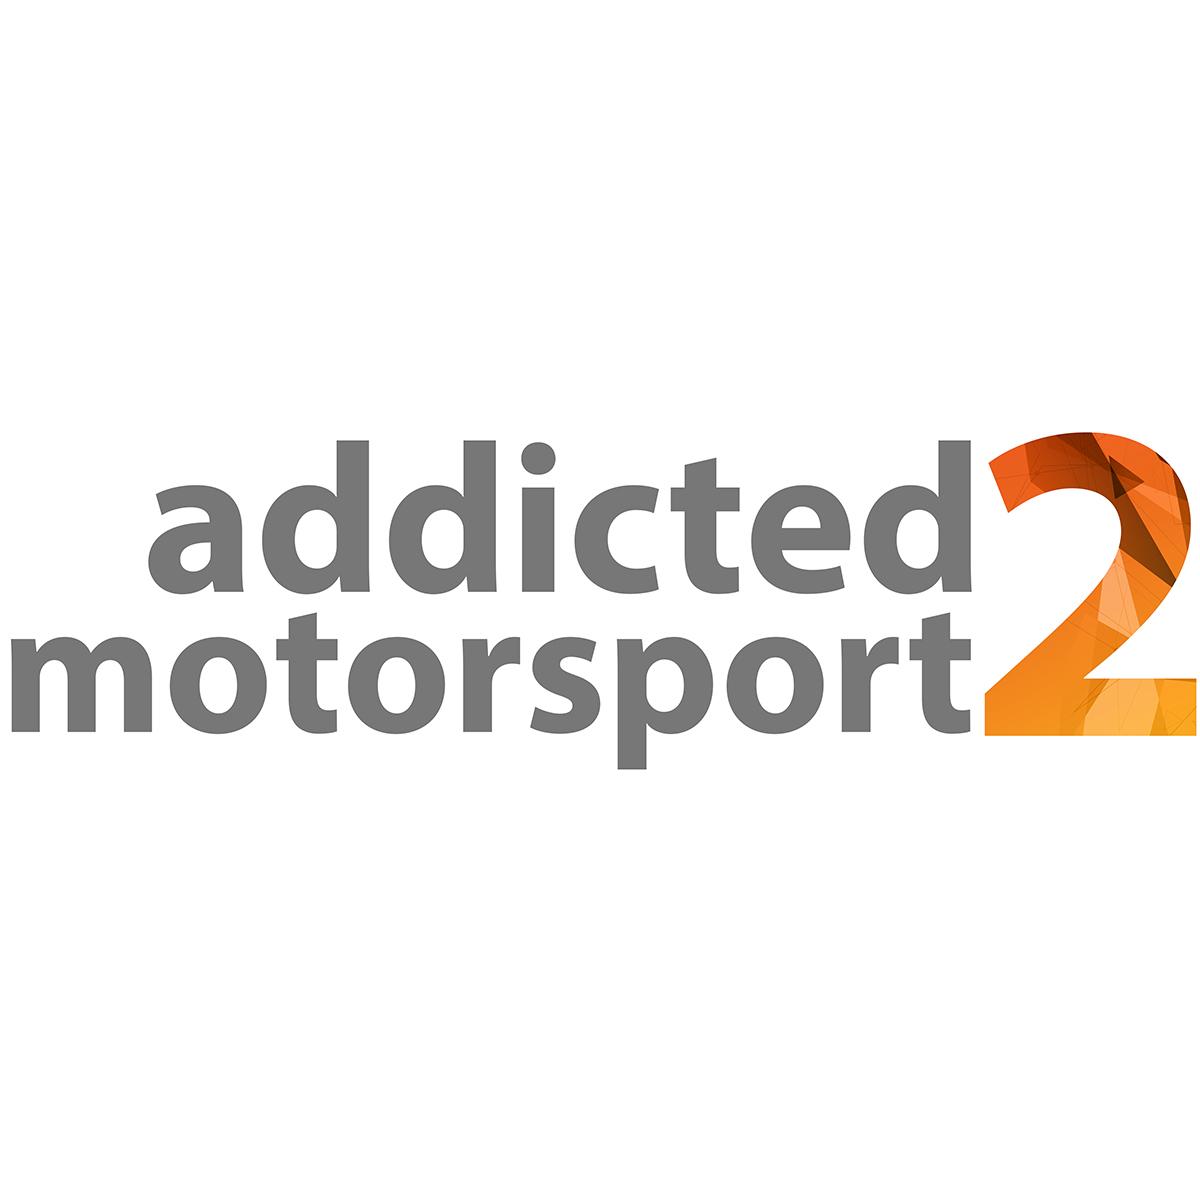 Avatar - addicted to motorsport